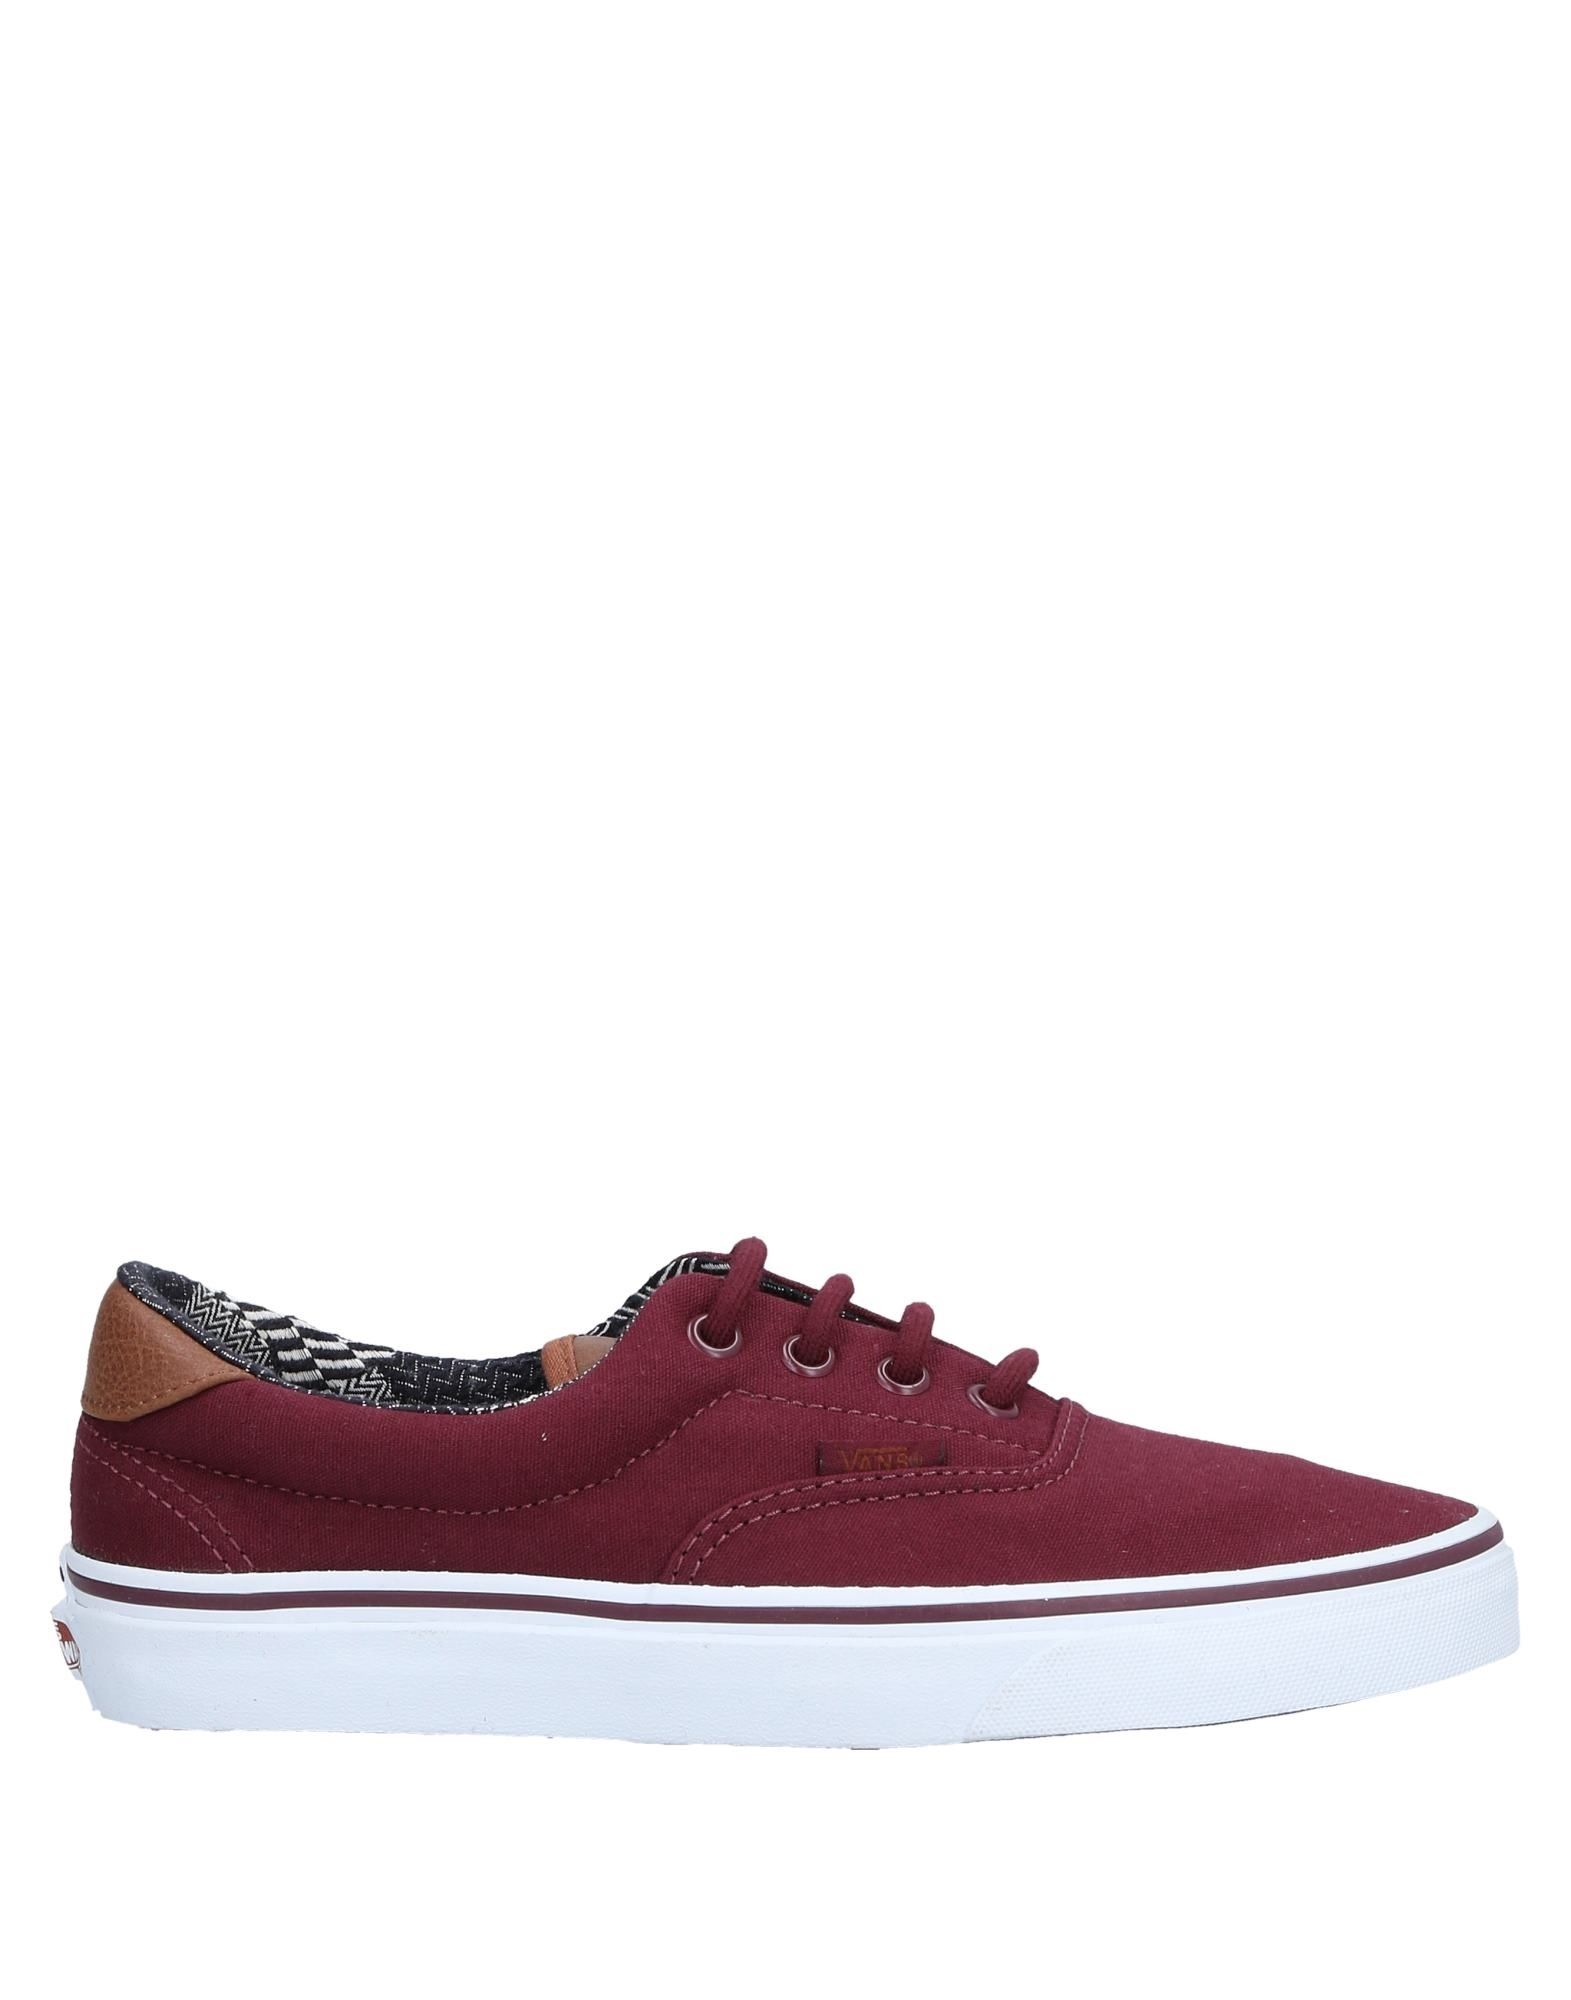 Vans Gute Sneakers Damen  11519914JU Gute Vans Qualität beliebte Schuhe 8b3c92